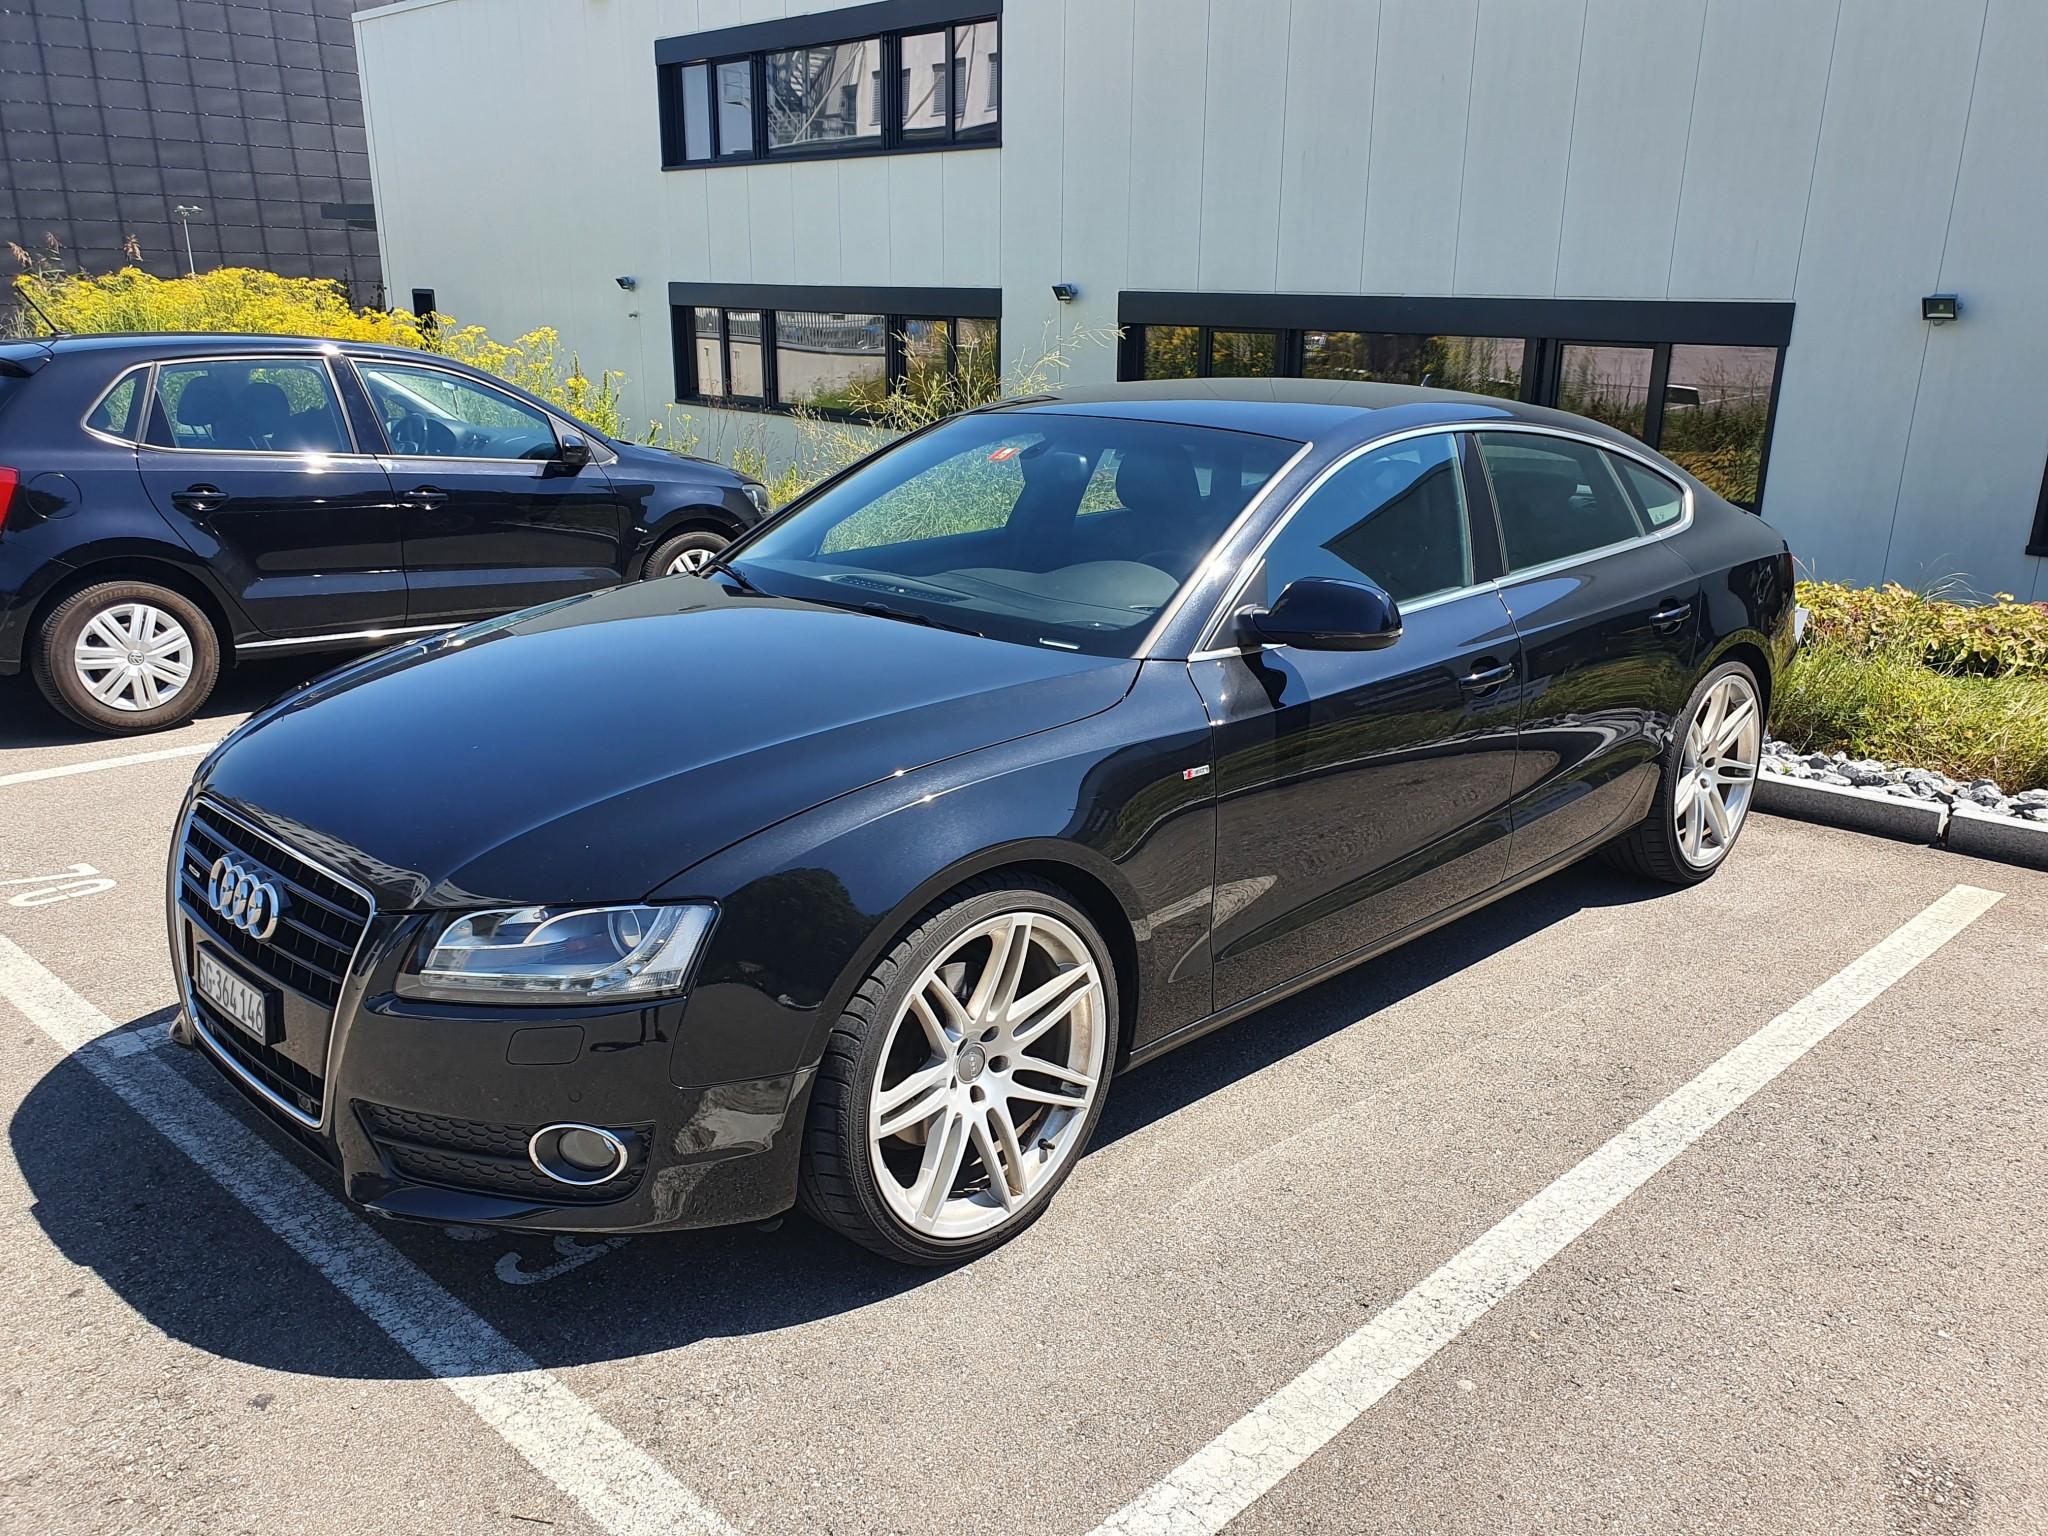 saloon Audi A5 3.2 SB s-line